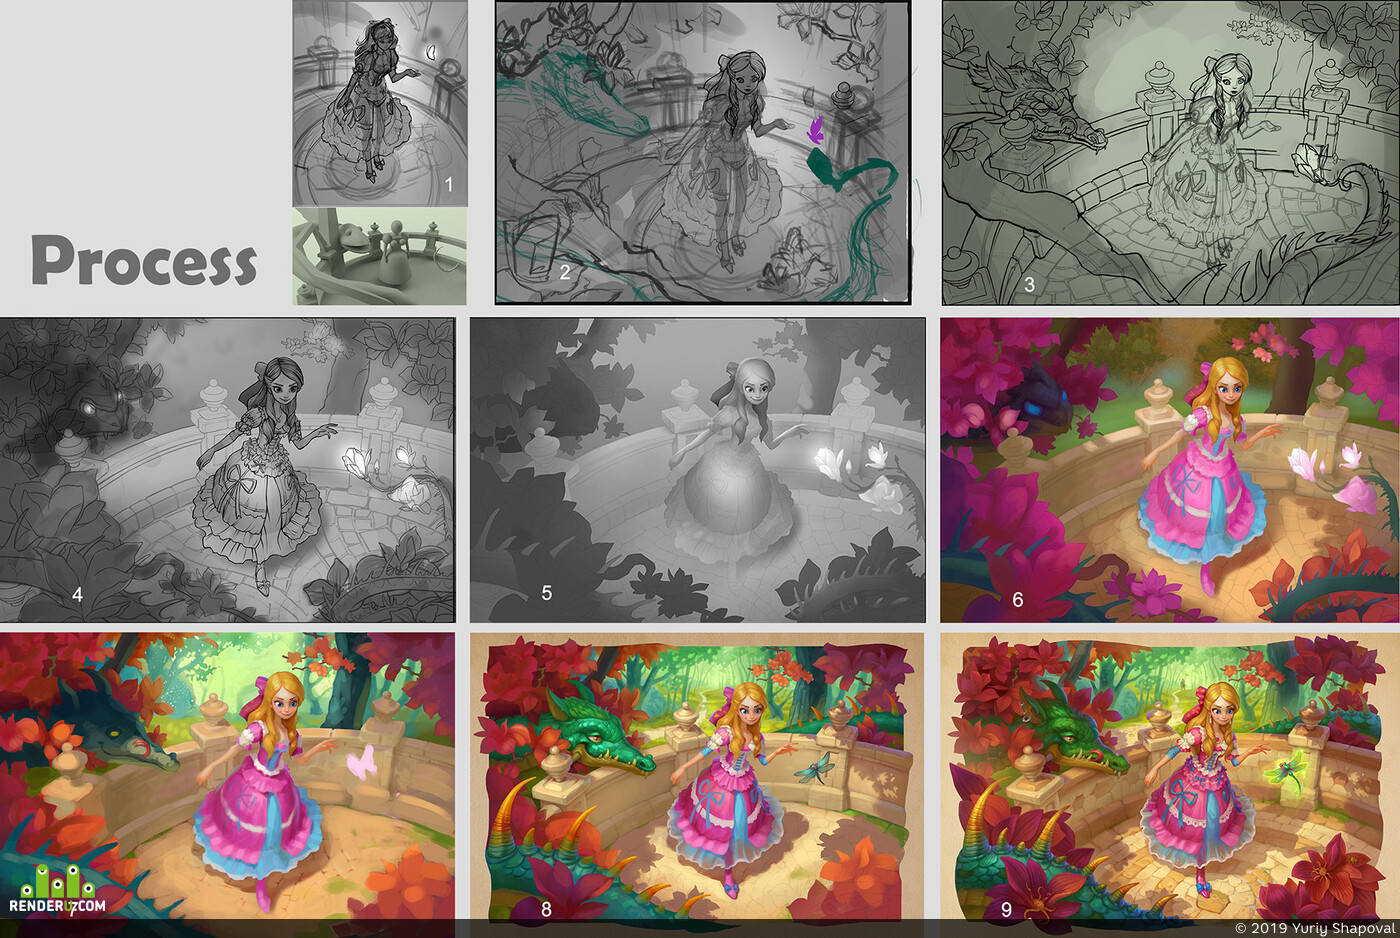 Digital 2D, Фэнтези, иллюстрация, дизайн персонажей, принцесса, дракон, девушка, дисней, цветок, замок